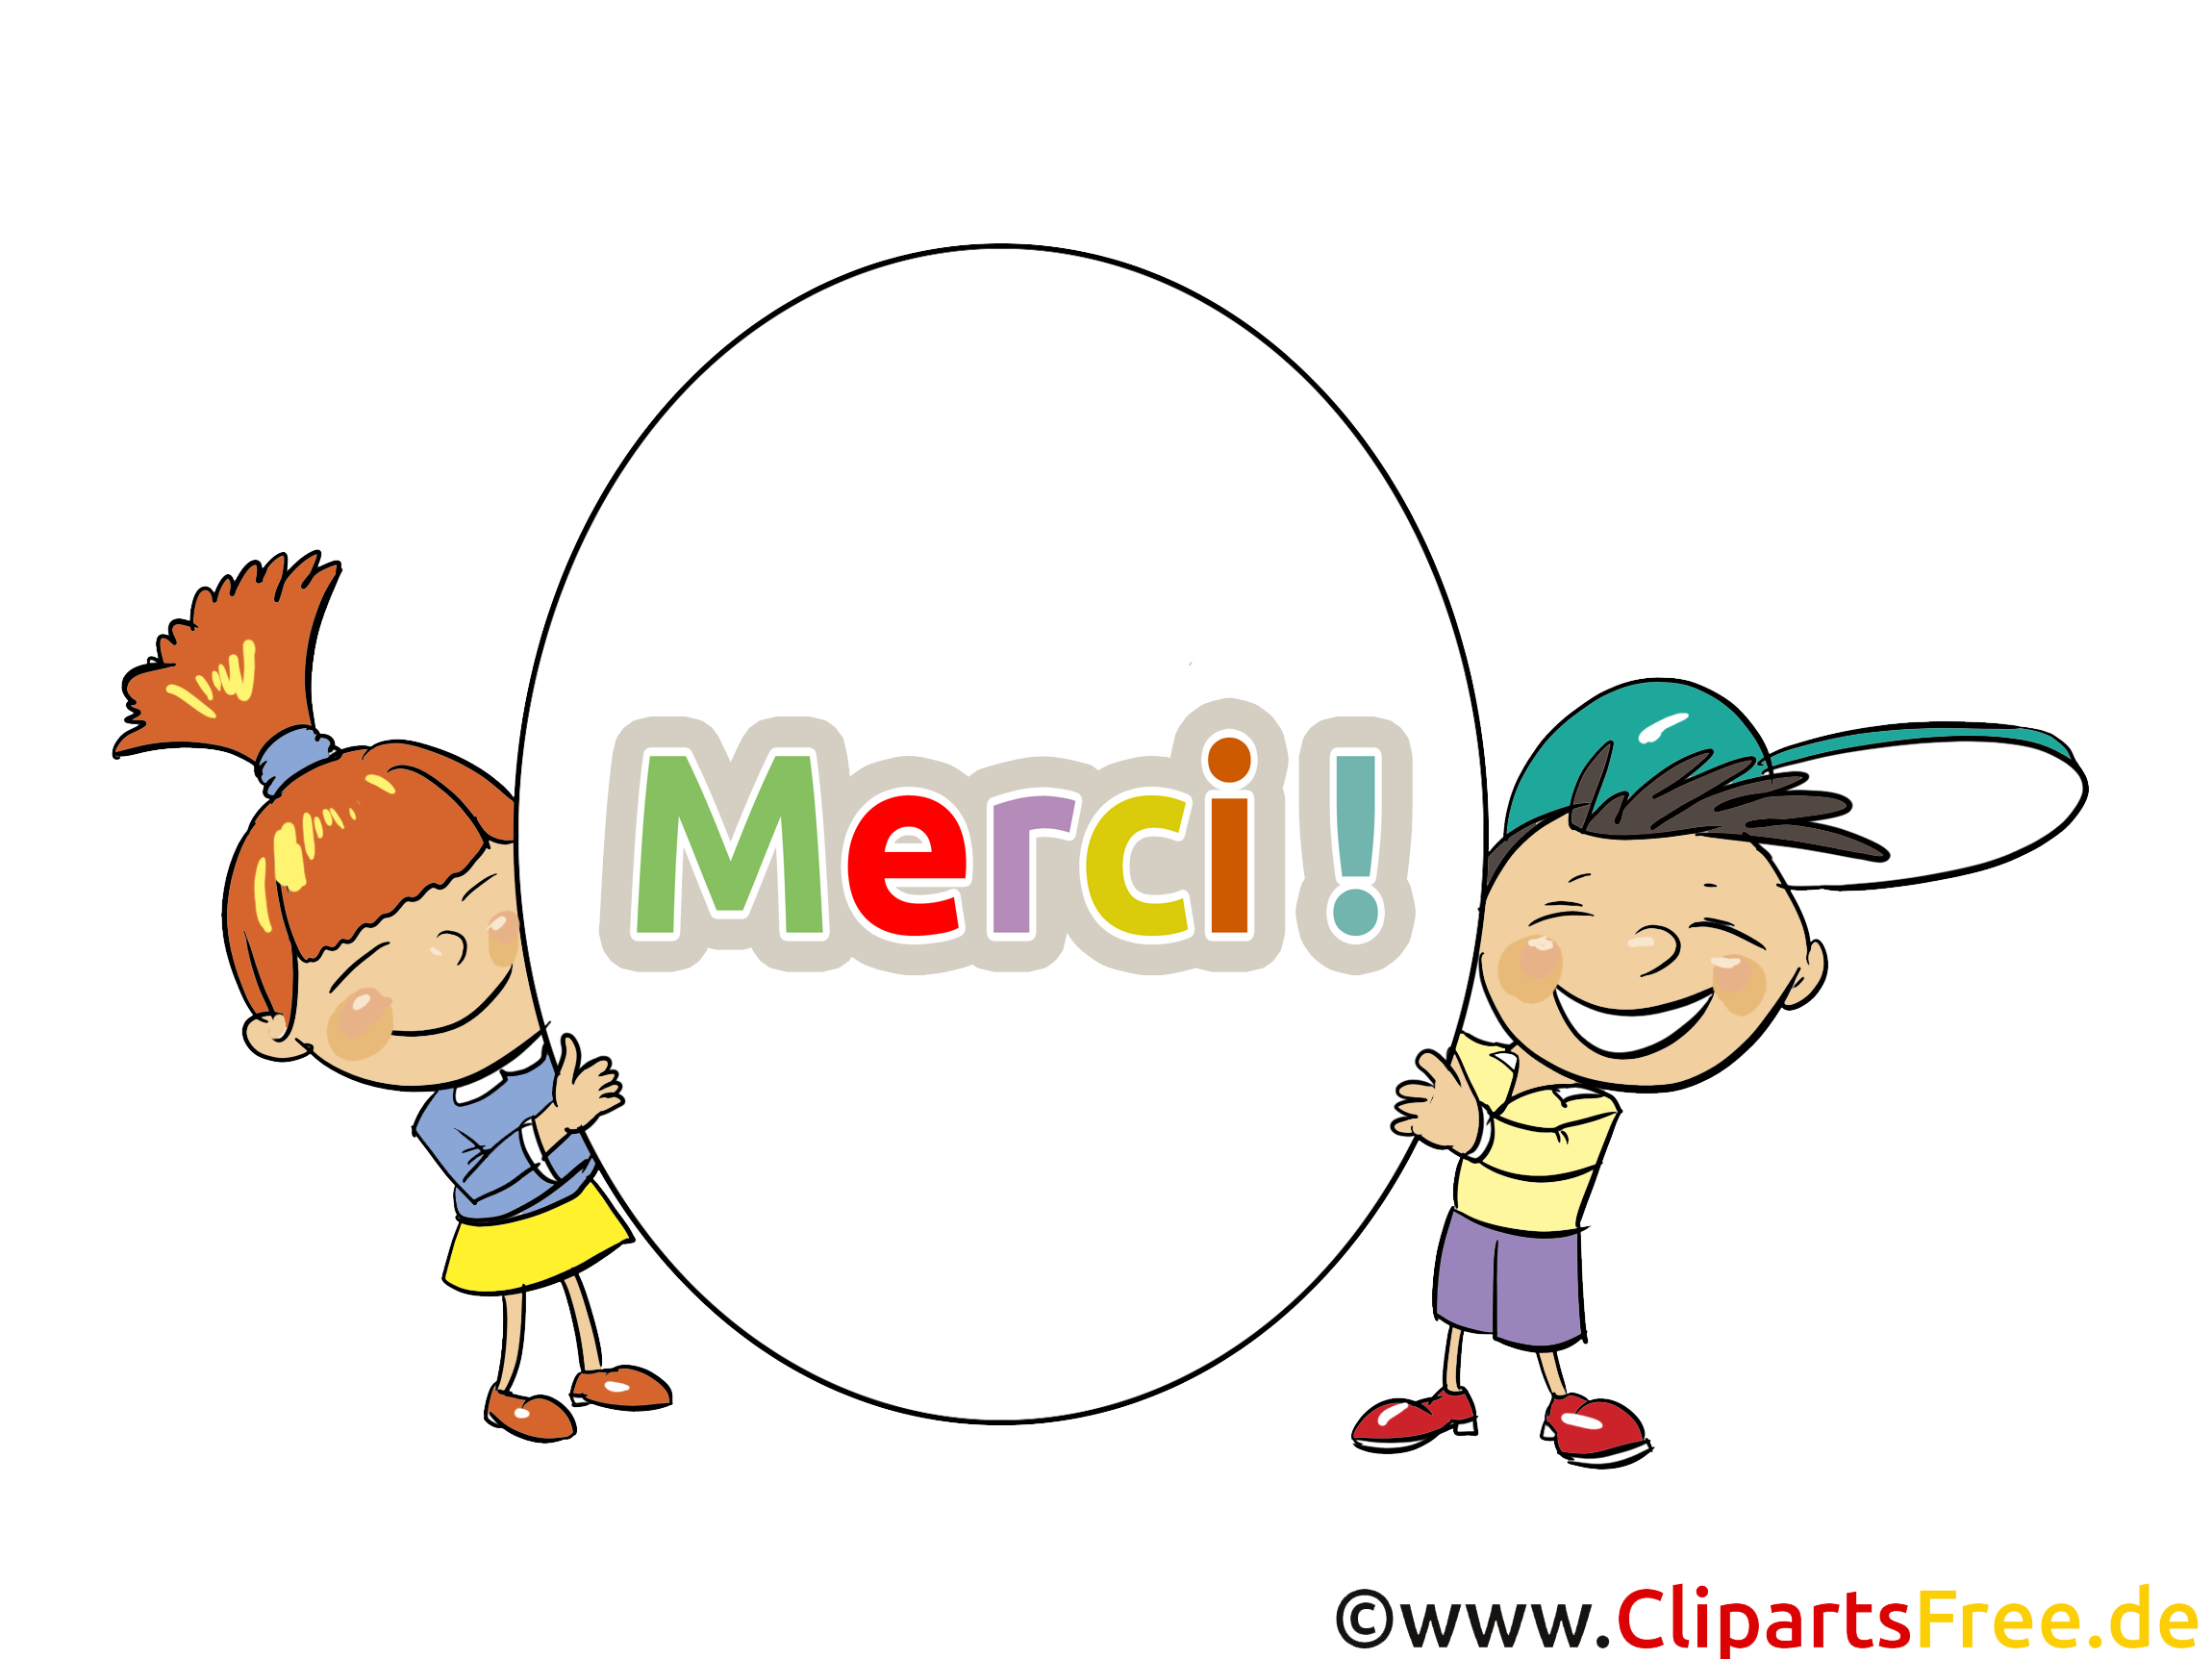 Enfants image gratuite merci cliparts merci dessin - Image dessin enfant ...